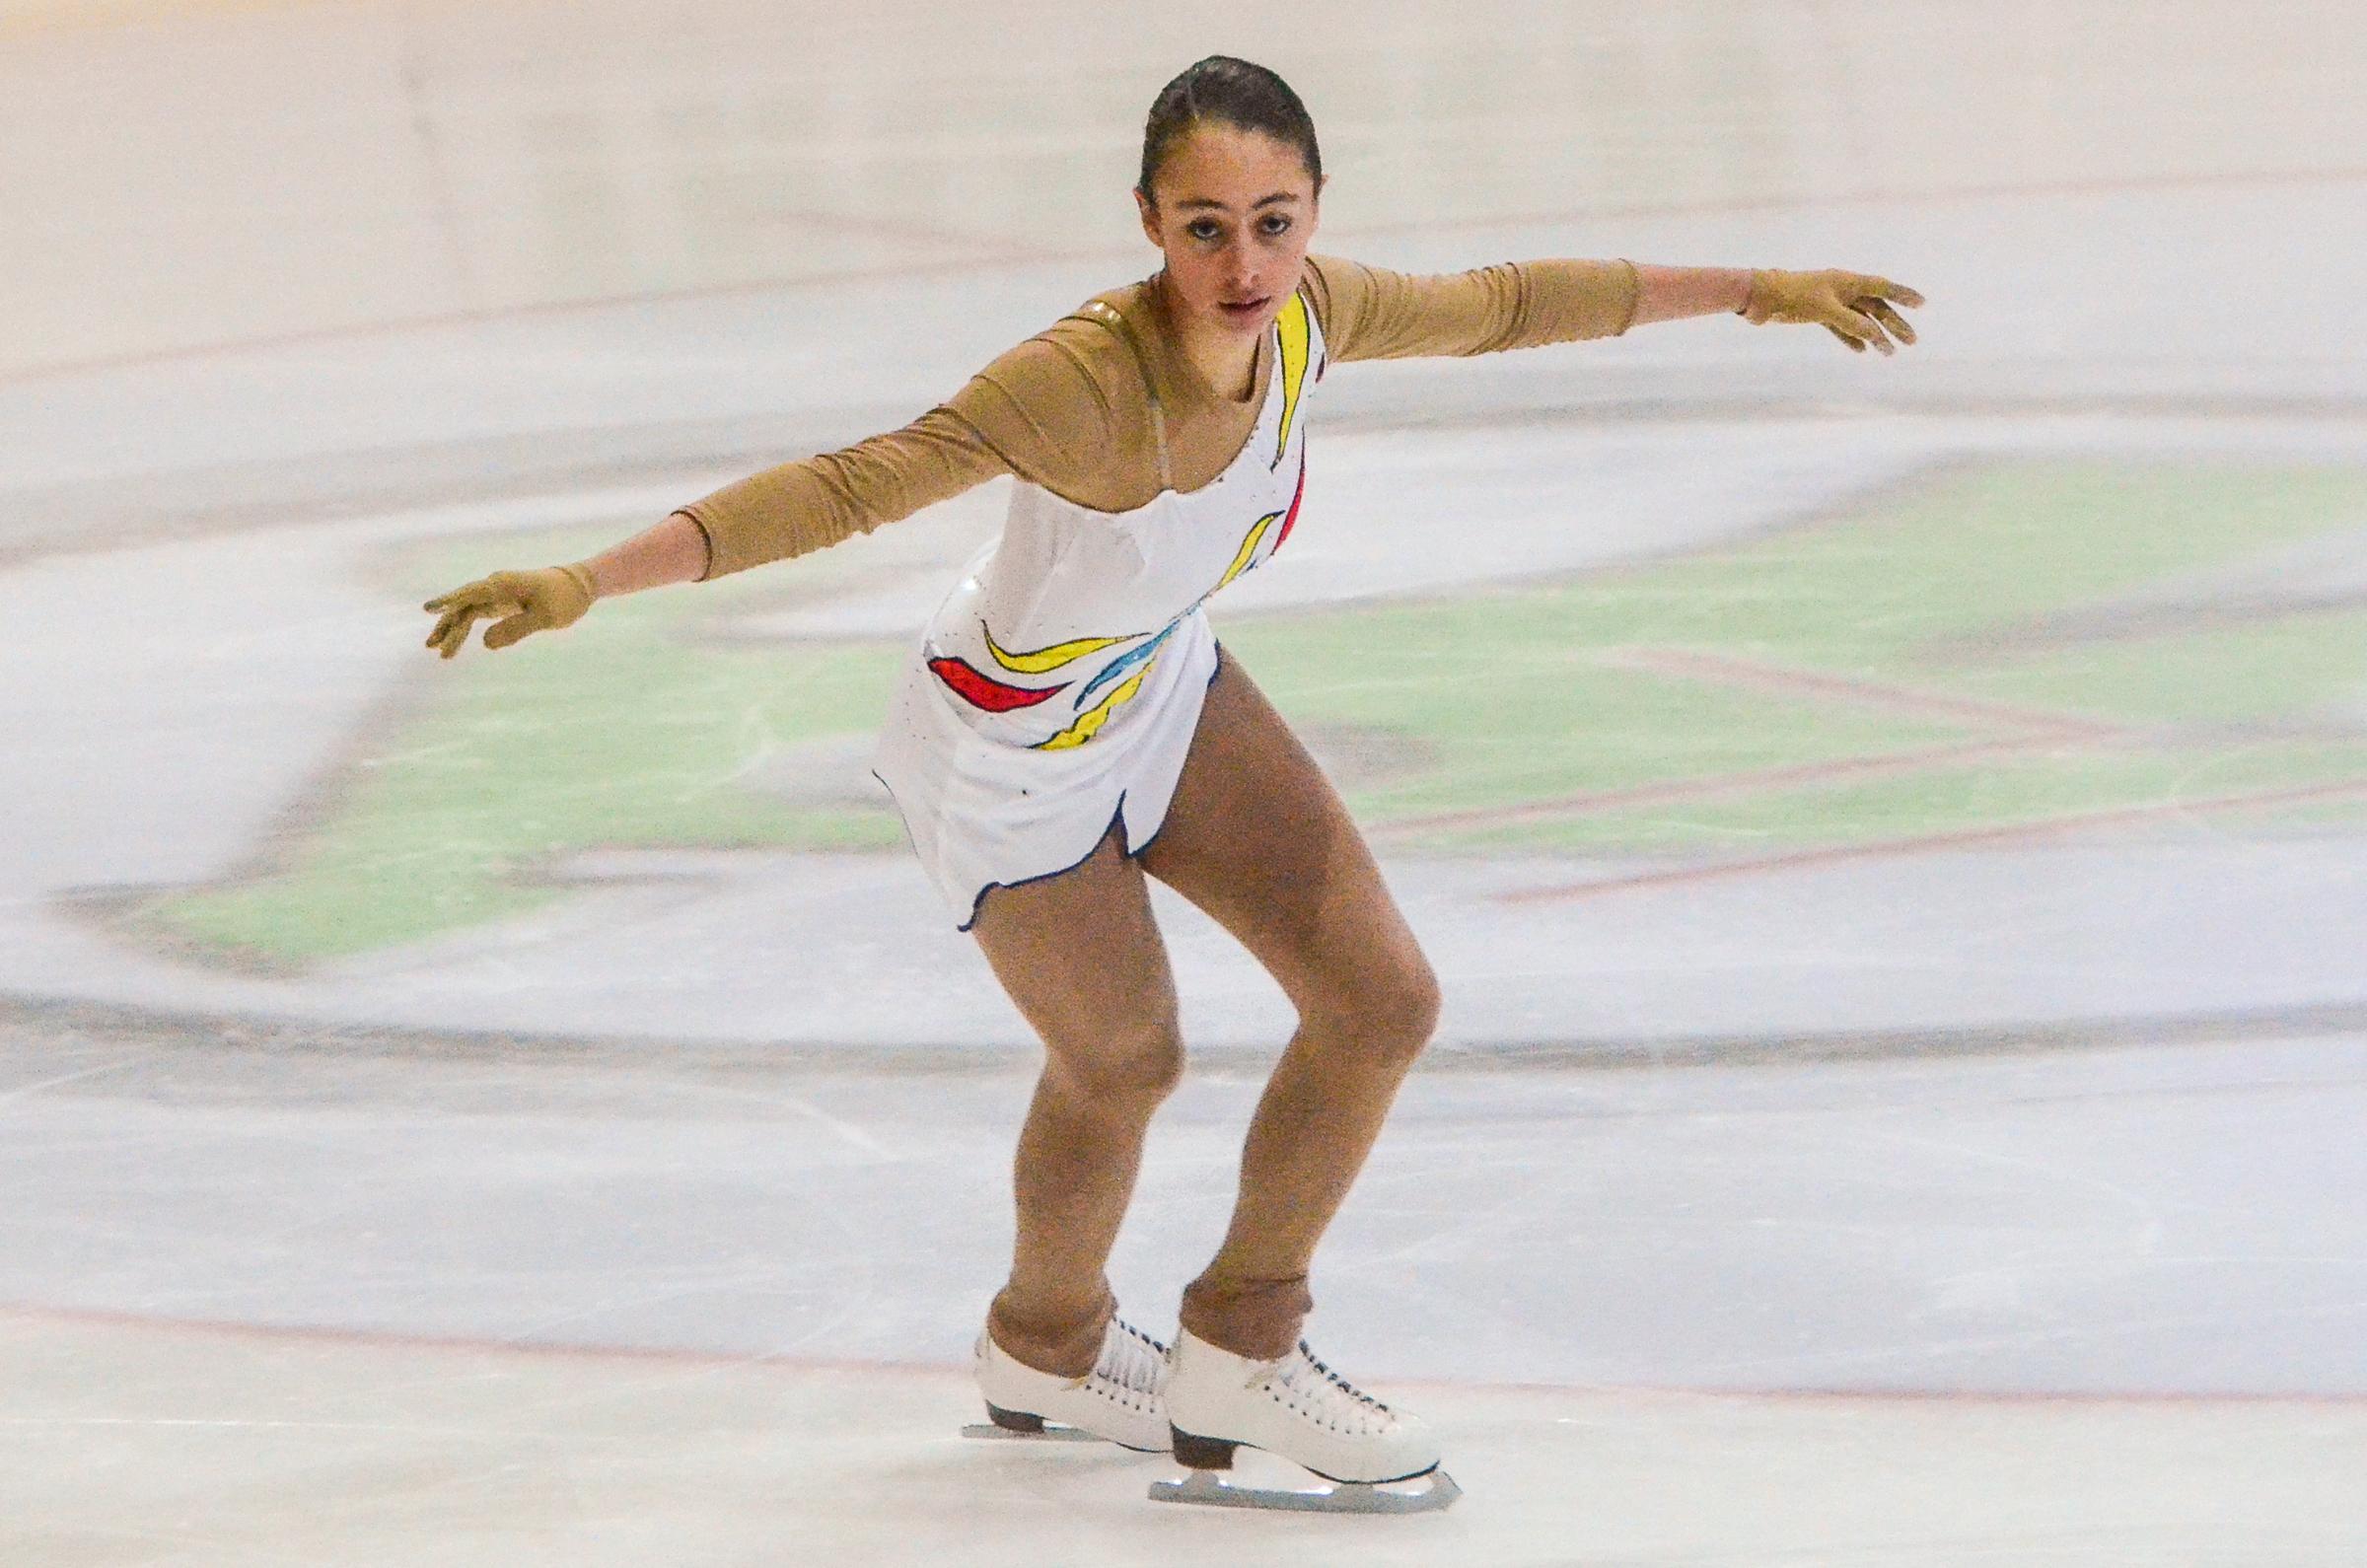 Nadia Mosberger